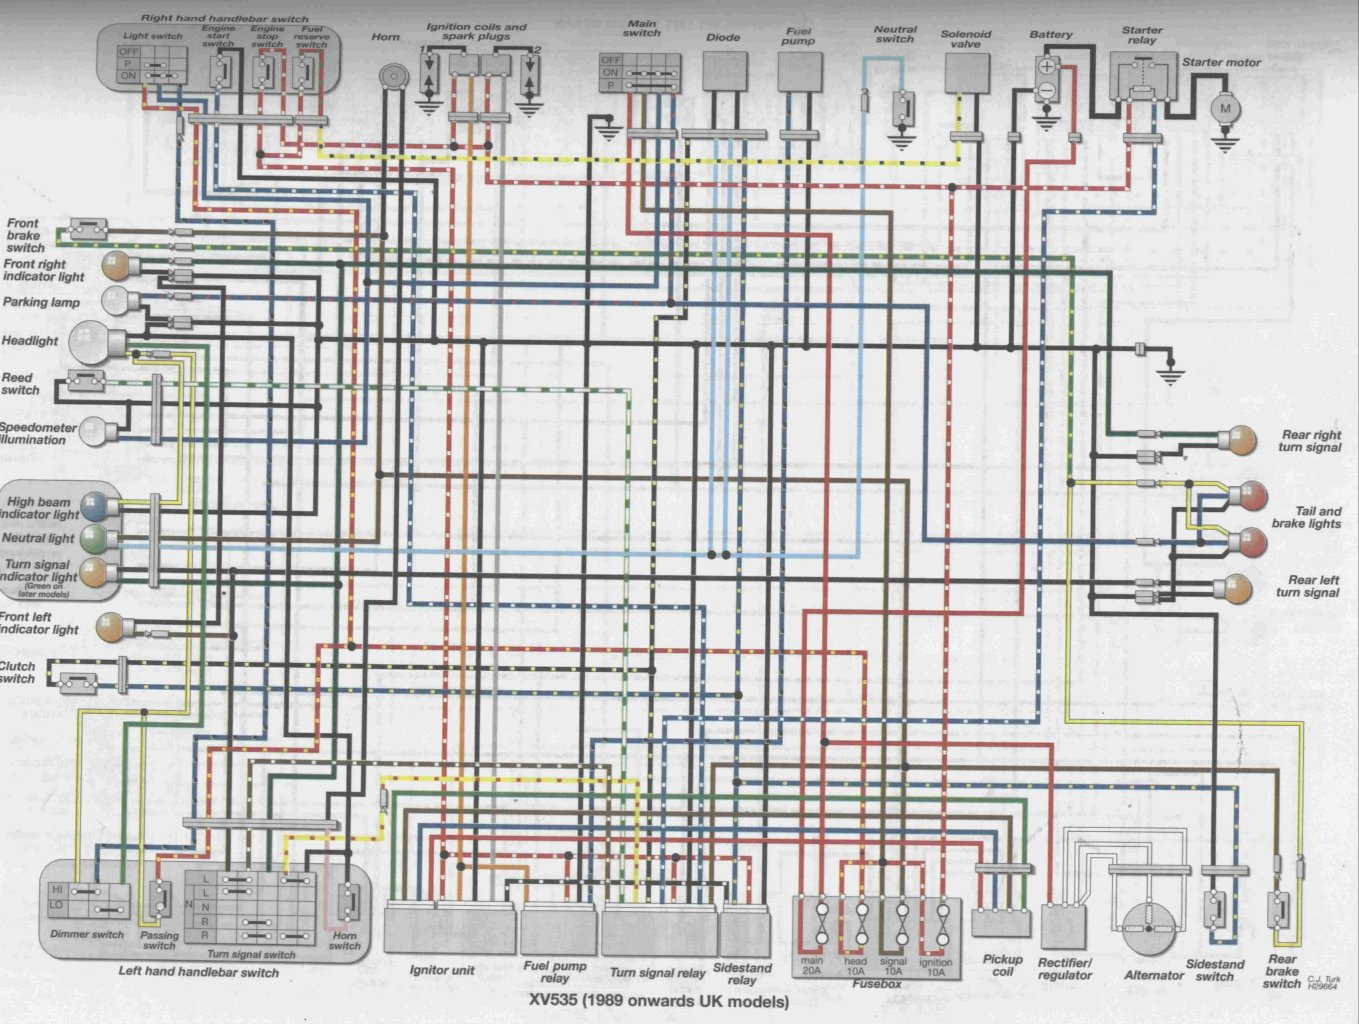 wiring diagram for signal stat 700 no 9967  hisun 700 wiring diagram schematic wiring  hisun 700 wiring diagram schematic wiring